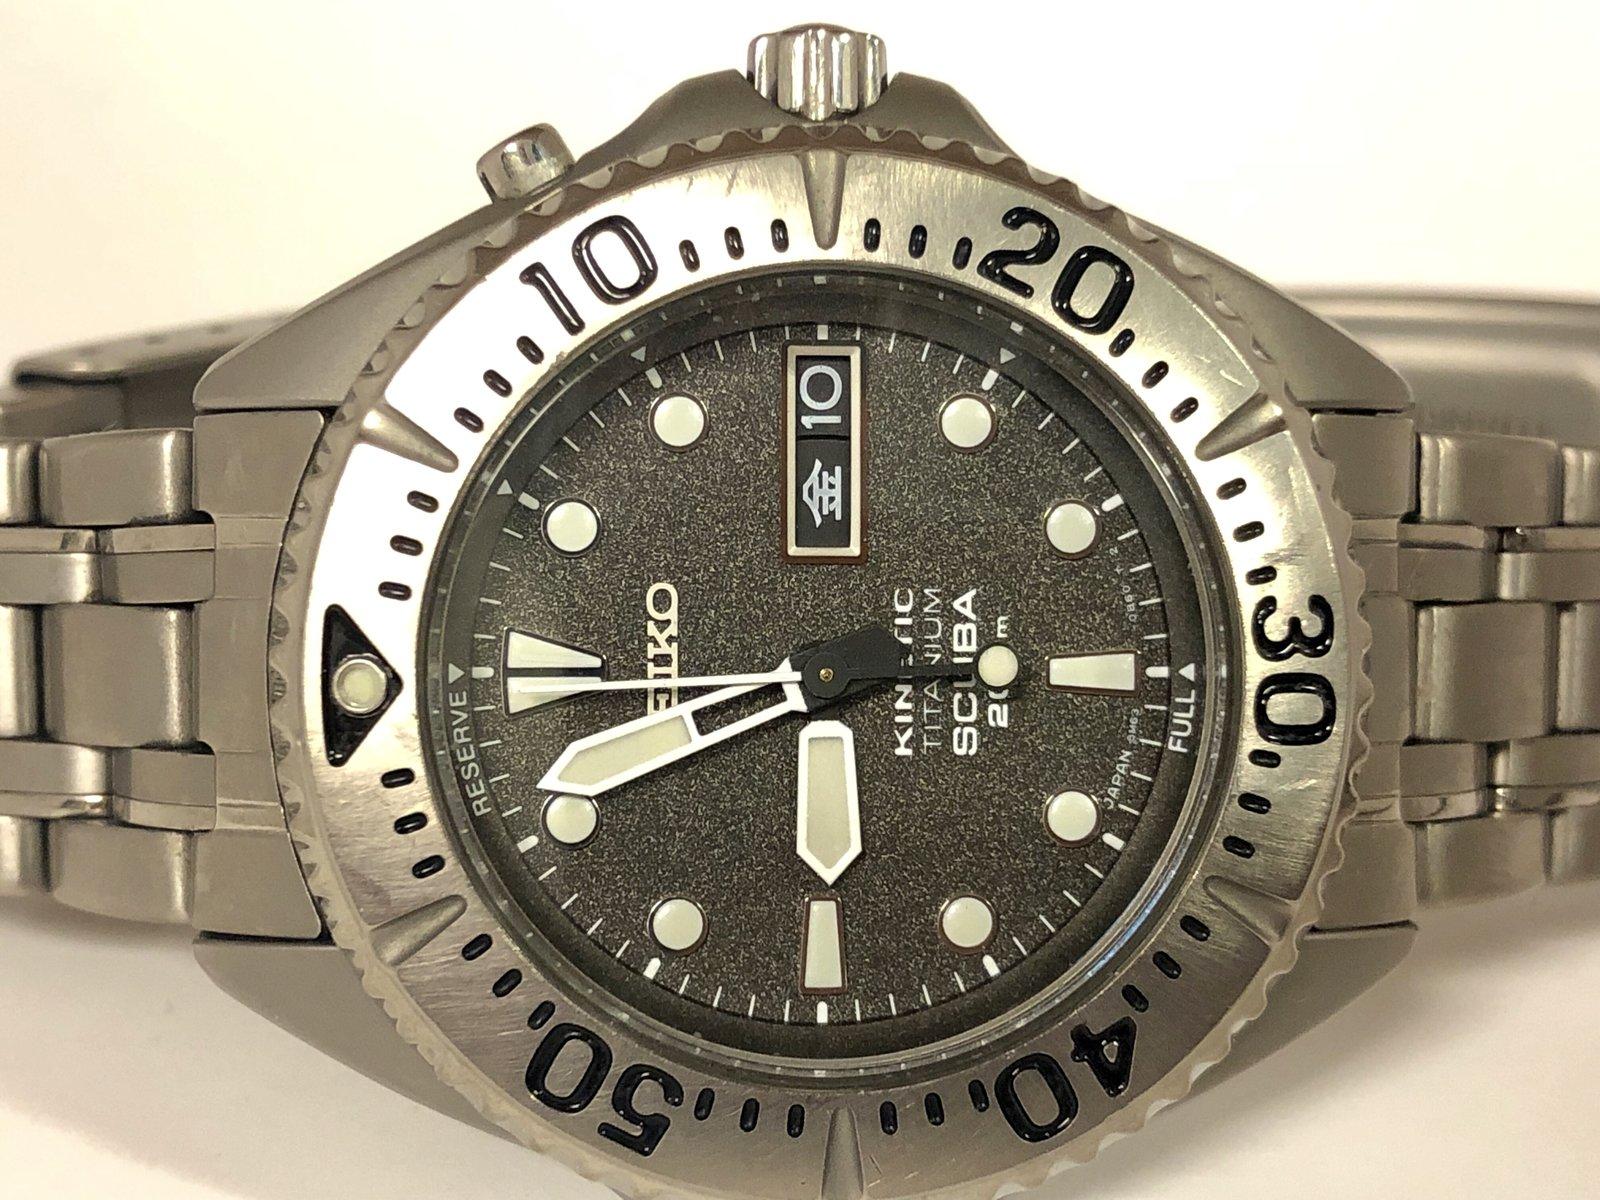 2DD94FAA-901C-45AF-B6AA-6D4927E06FE2.jpeg